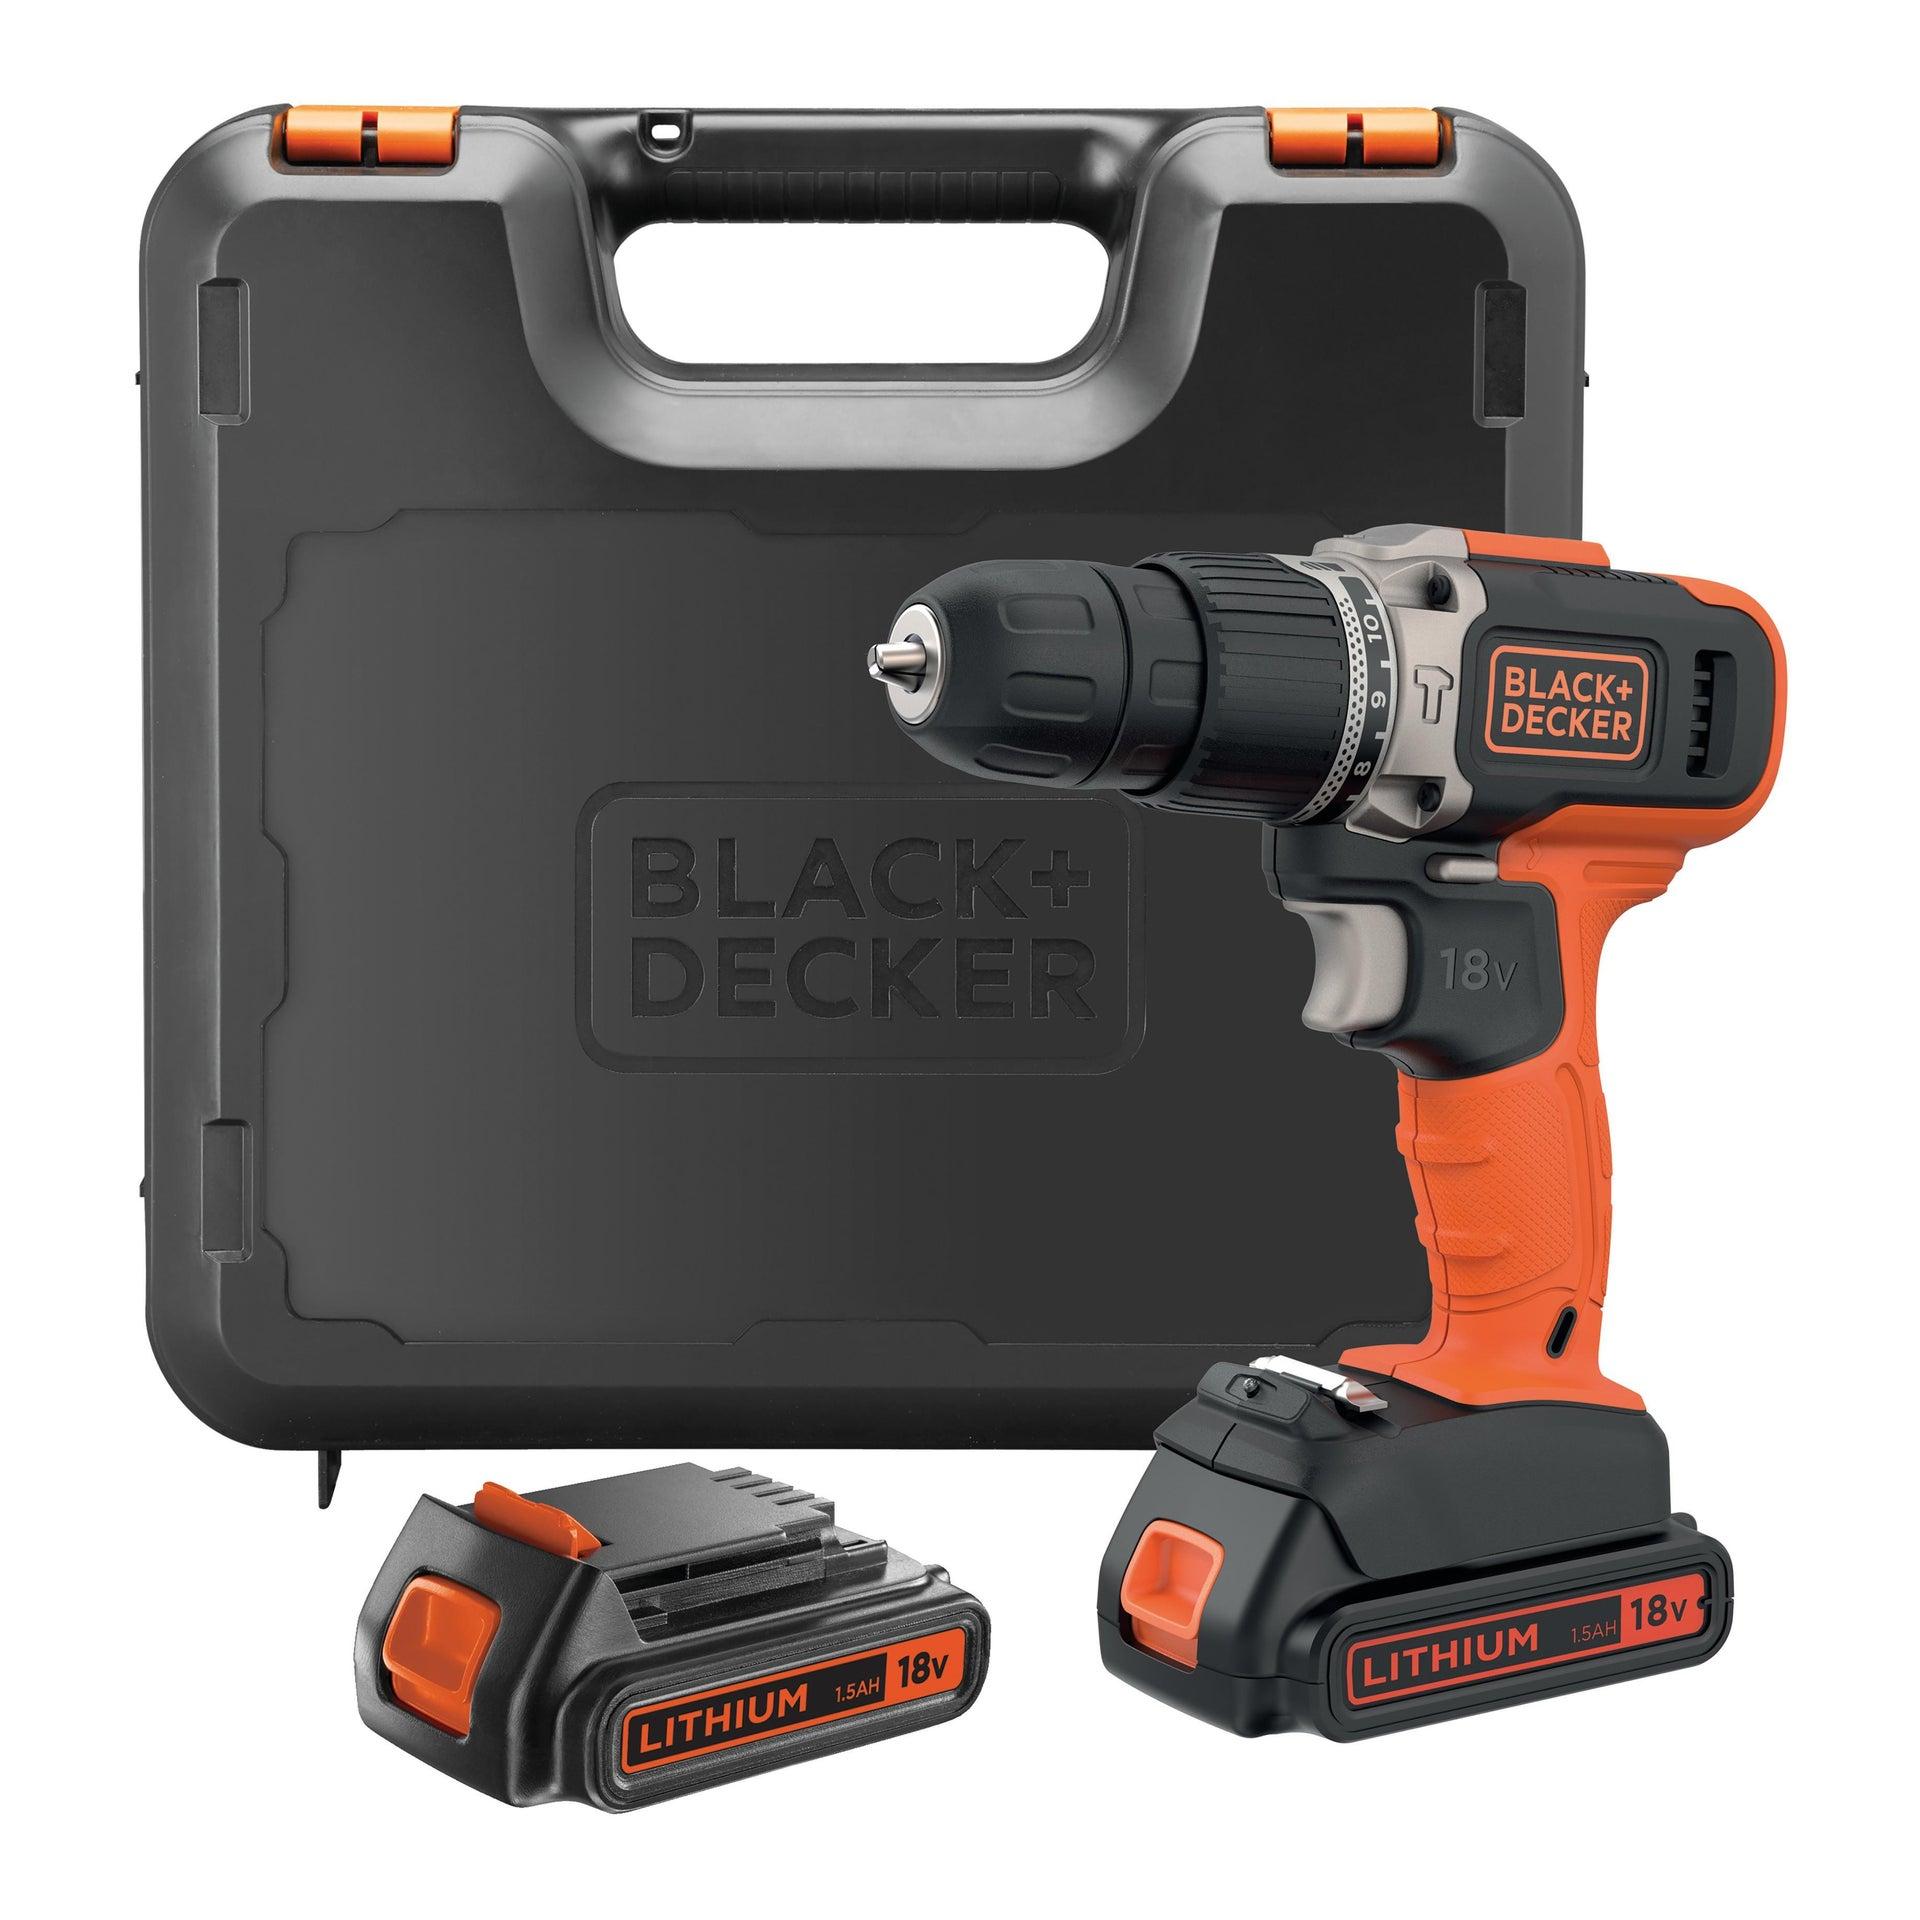 Trapano avvitatore a batteria BLACK + DECKER BCD003C2K 18 V, 1.5 Ah, 2 batterie - 1